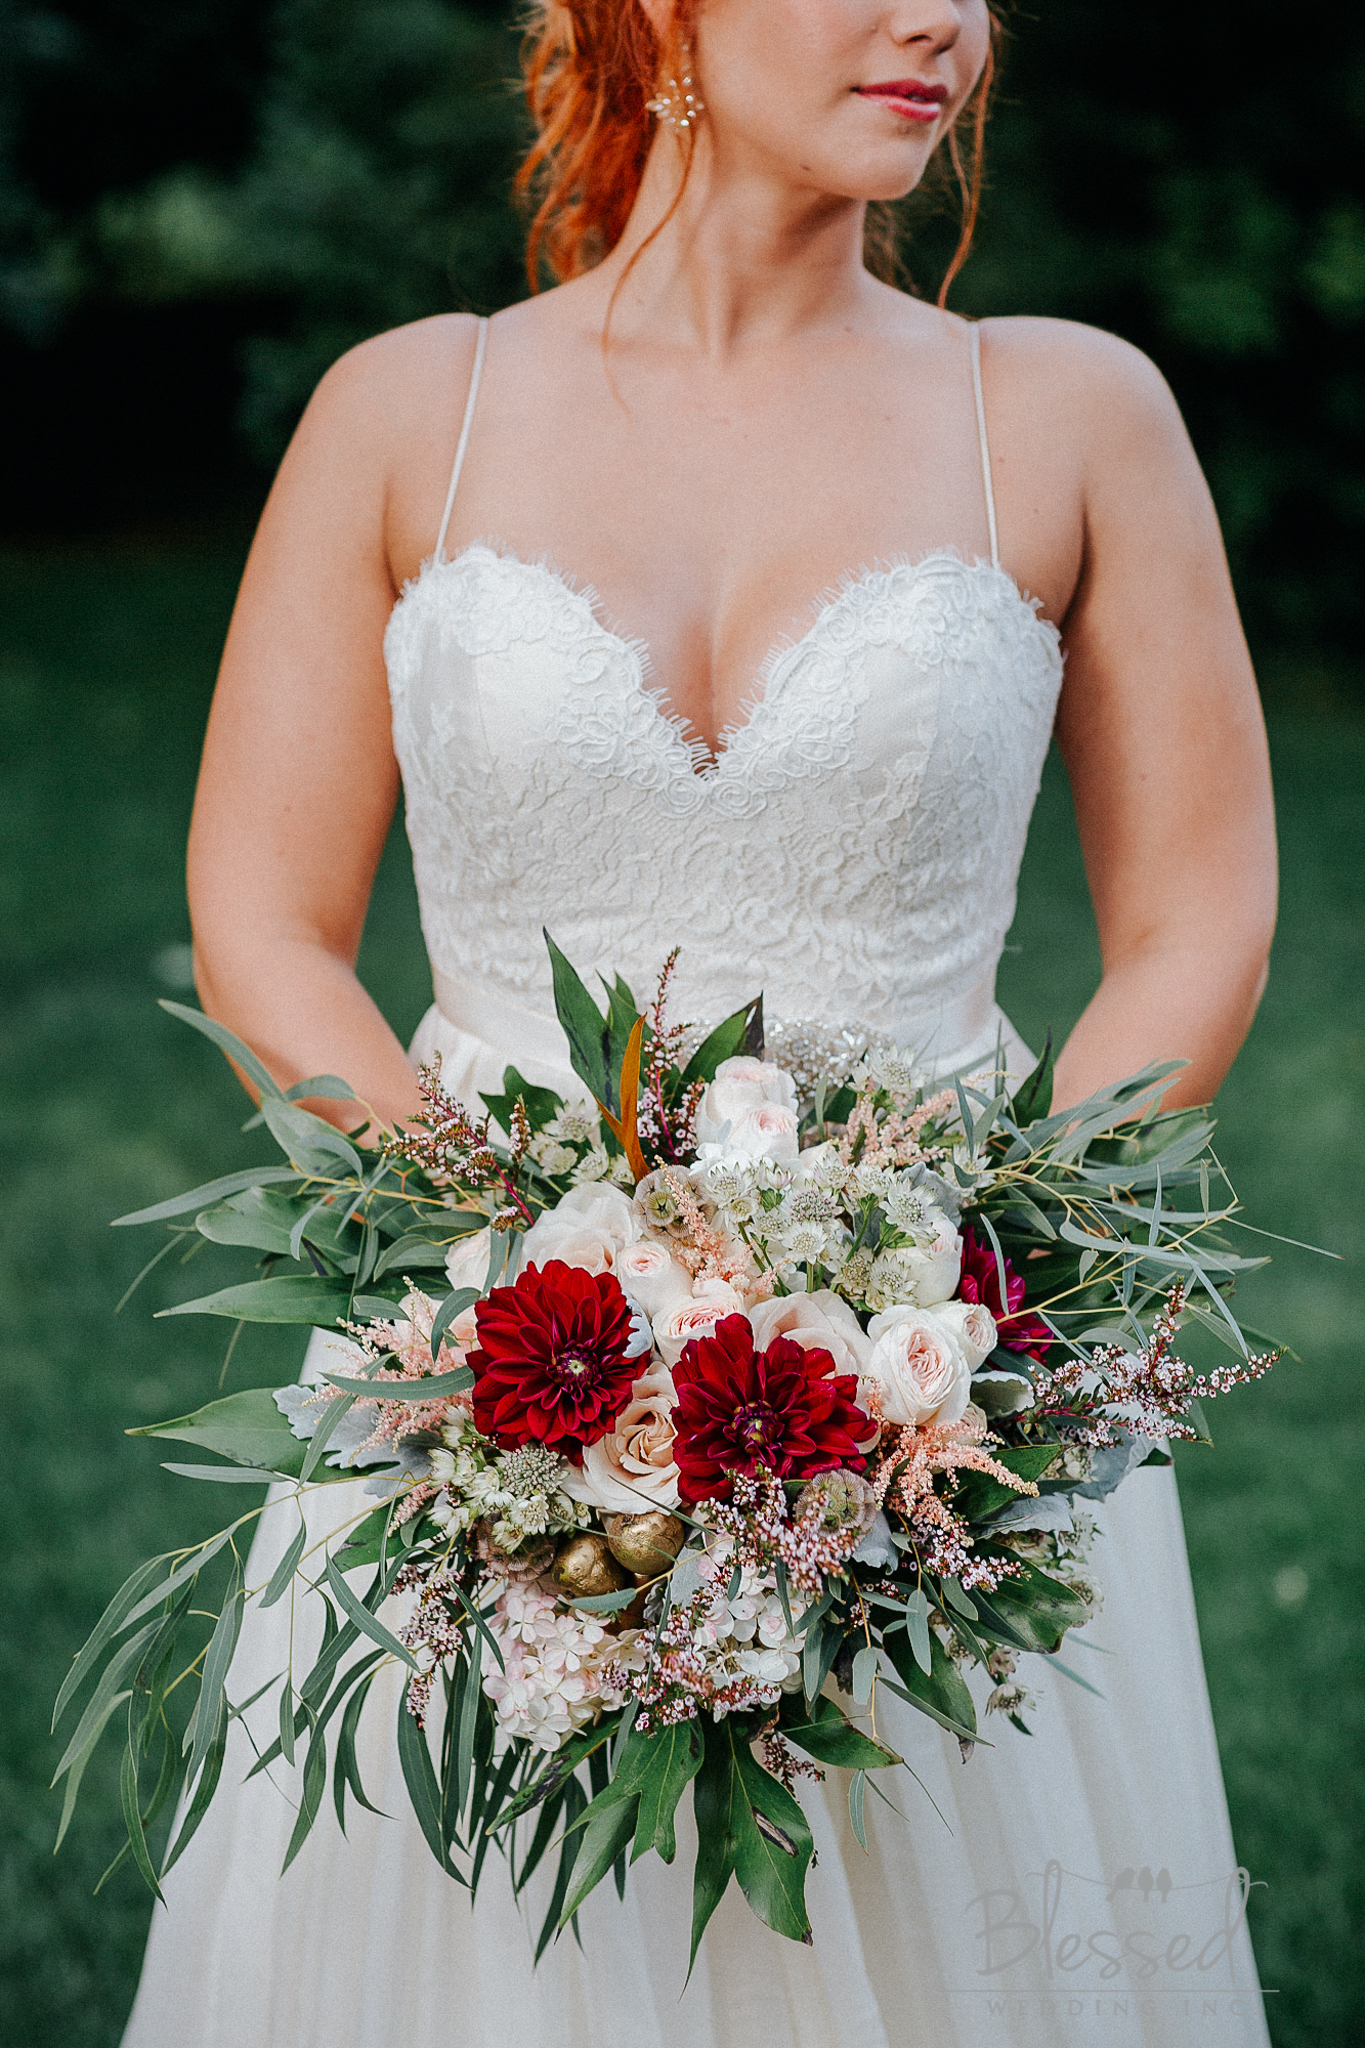 Destination Wedding Photography Minnesota By Blessed Wedding Photographers-45.jpg